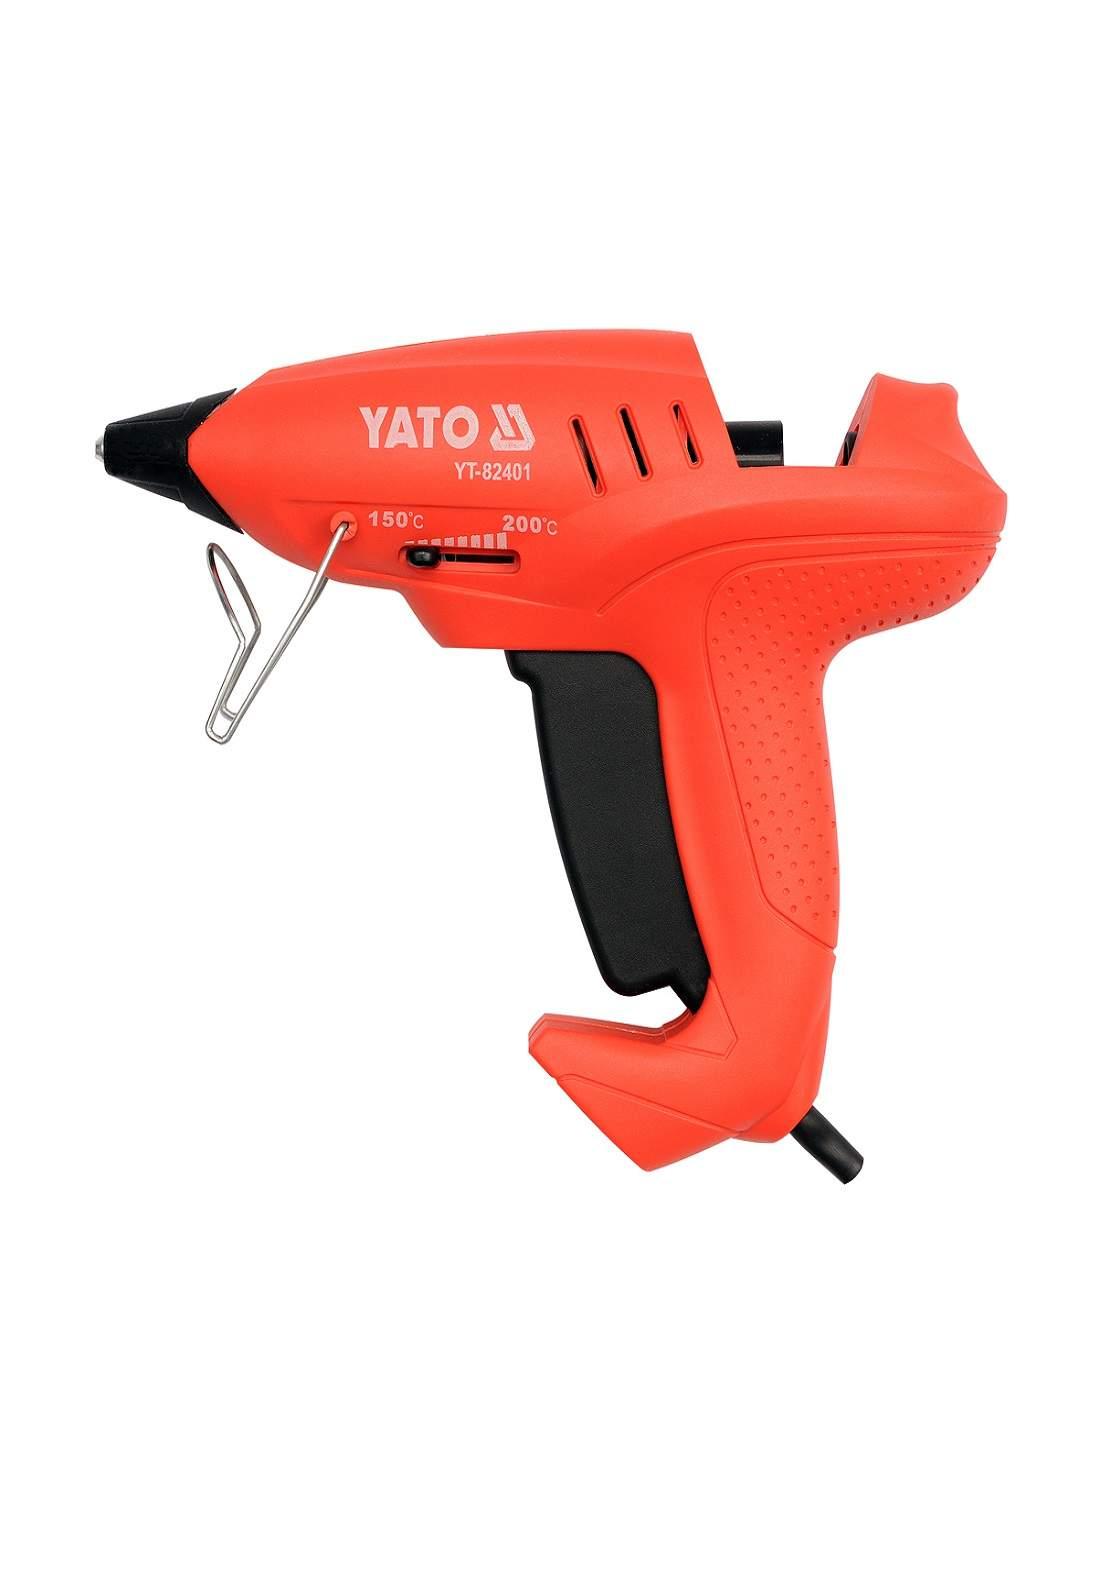 Yato YT-82401 Glu Gun 35 (400) W  مسدس سيليكون